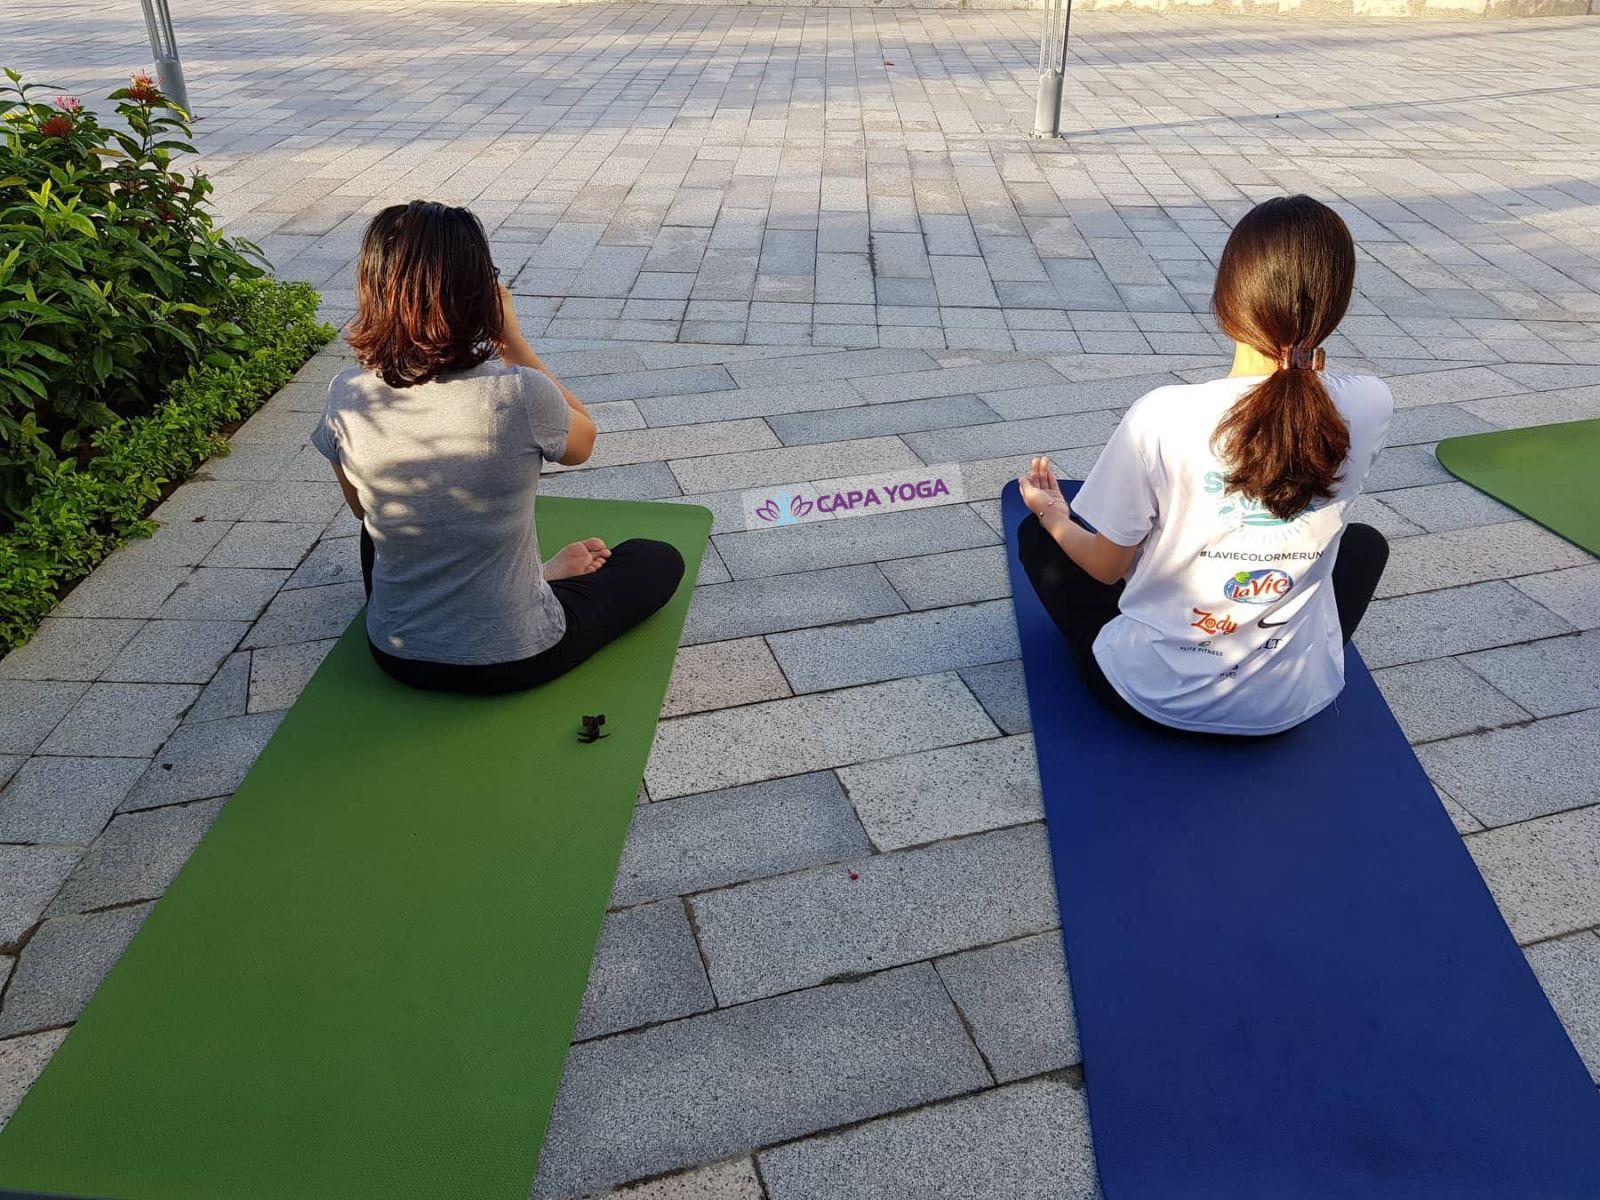 Mua thảm Yoga du lịch cao cấp